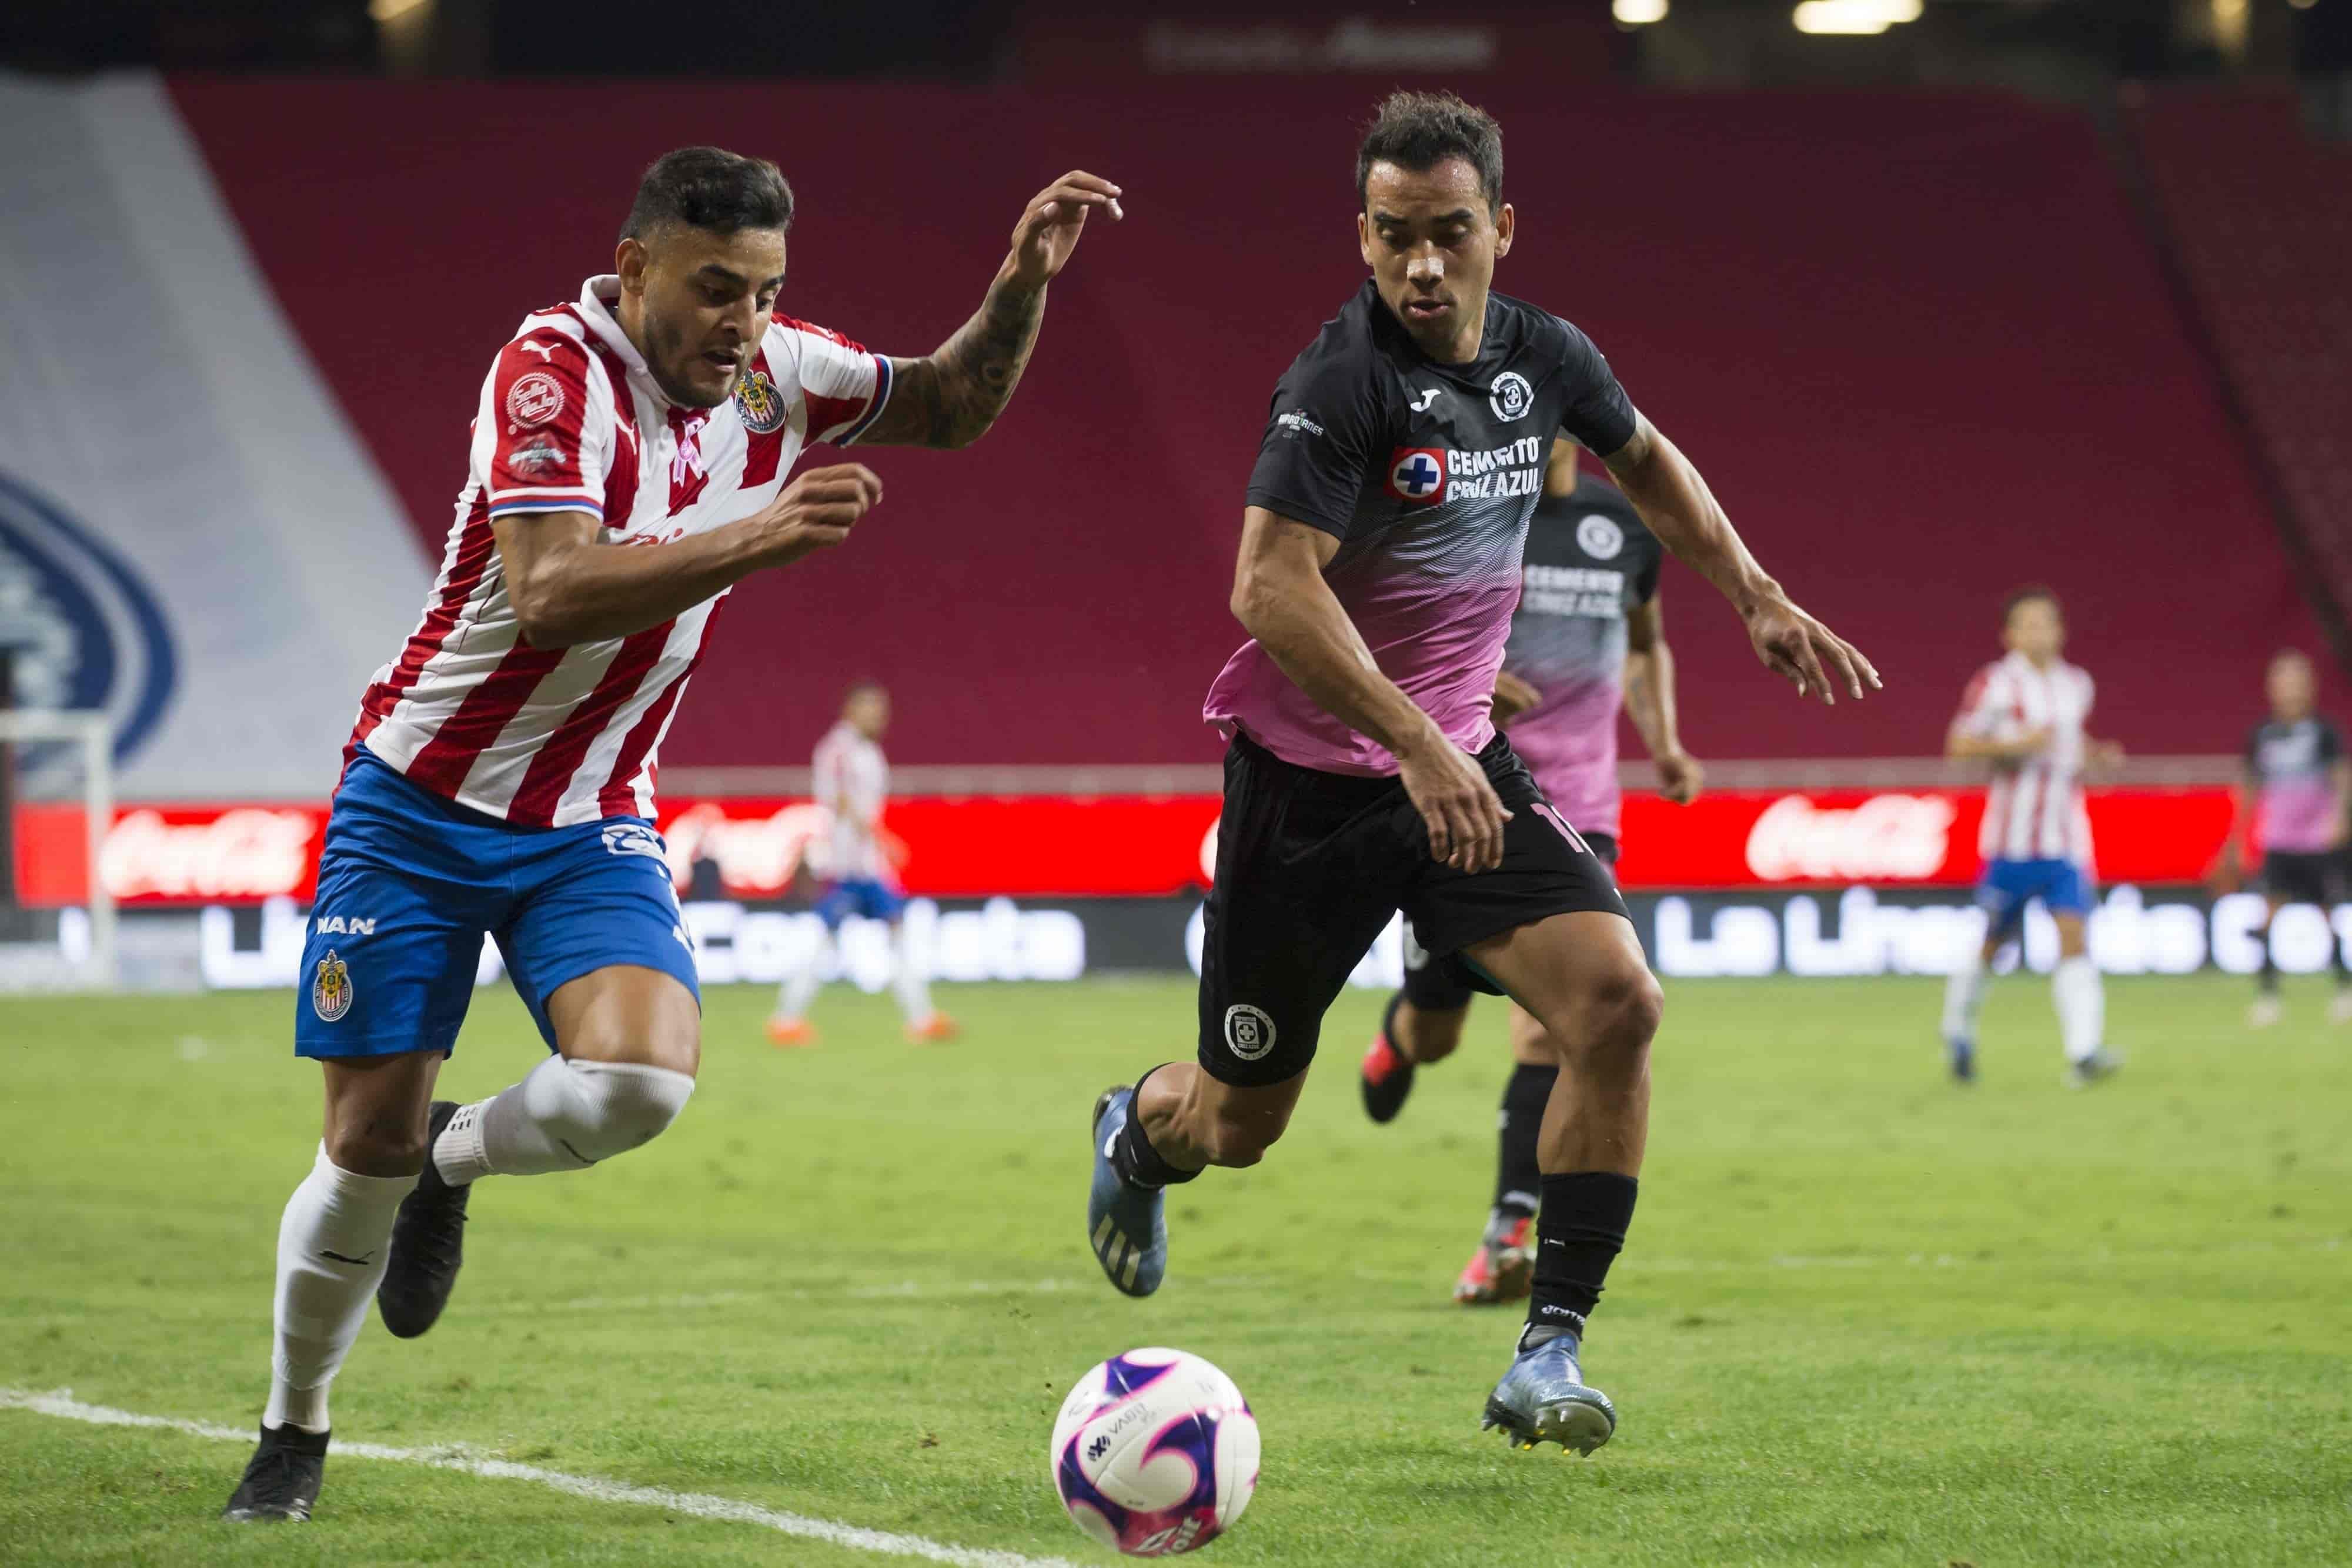 Chivas 0-2 Cruz Azul